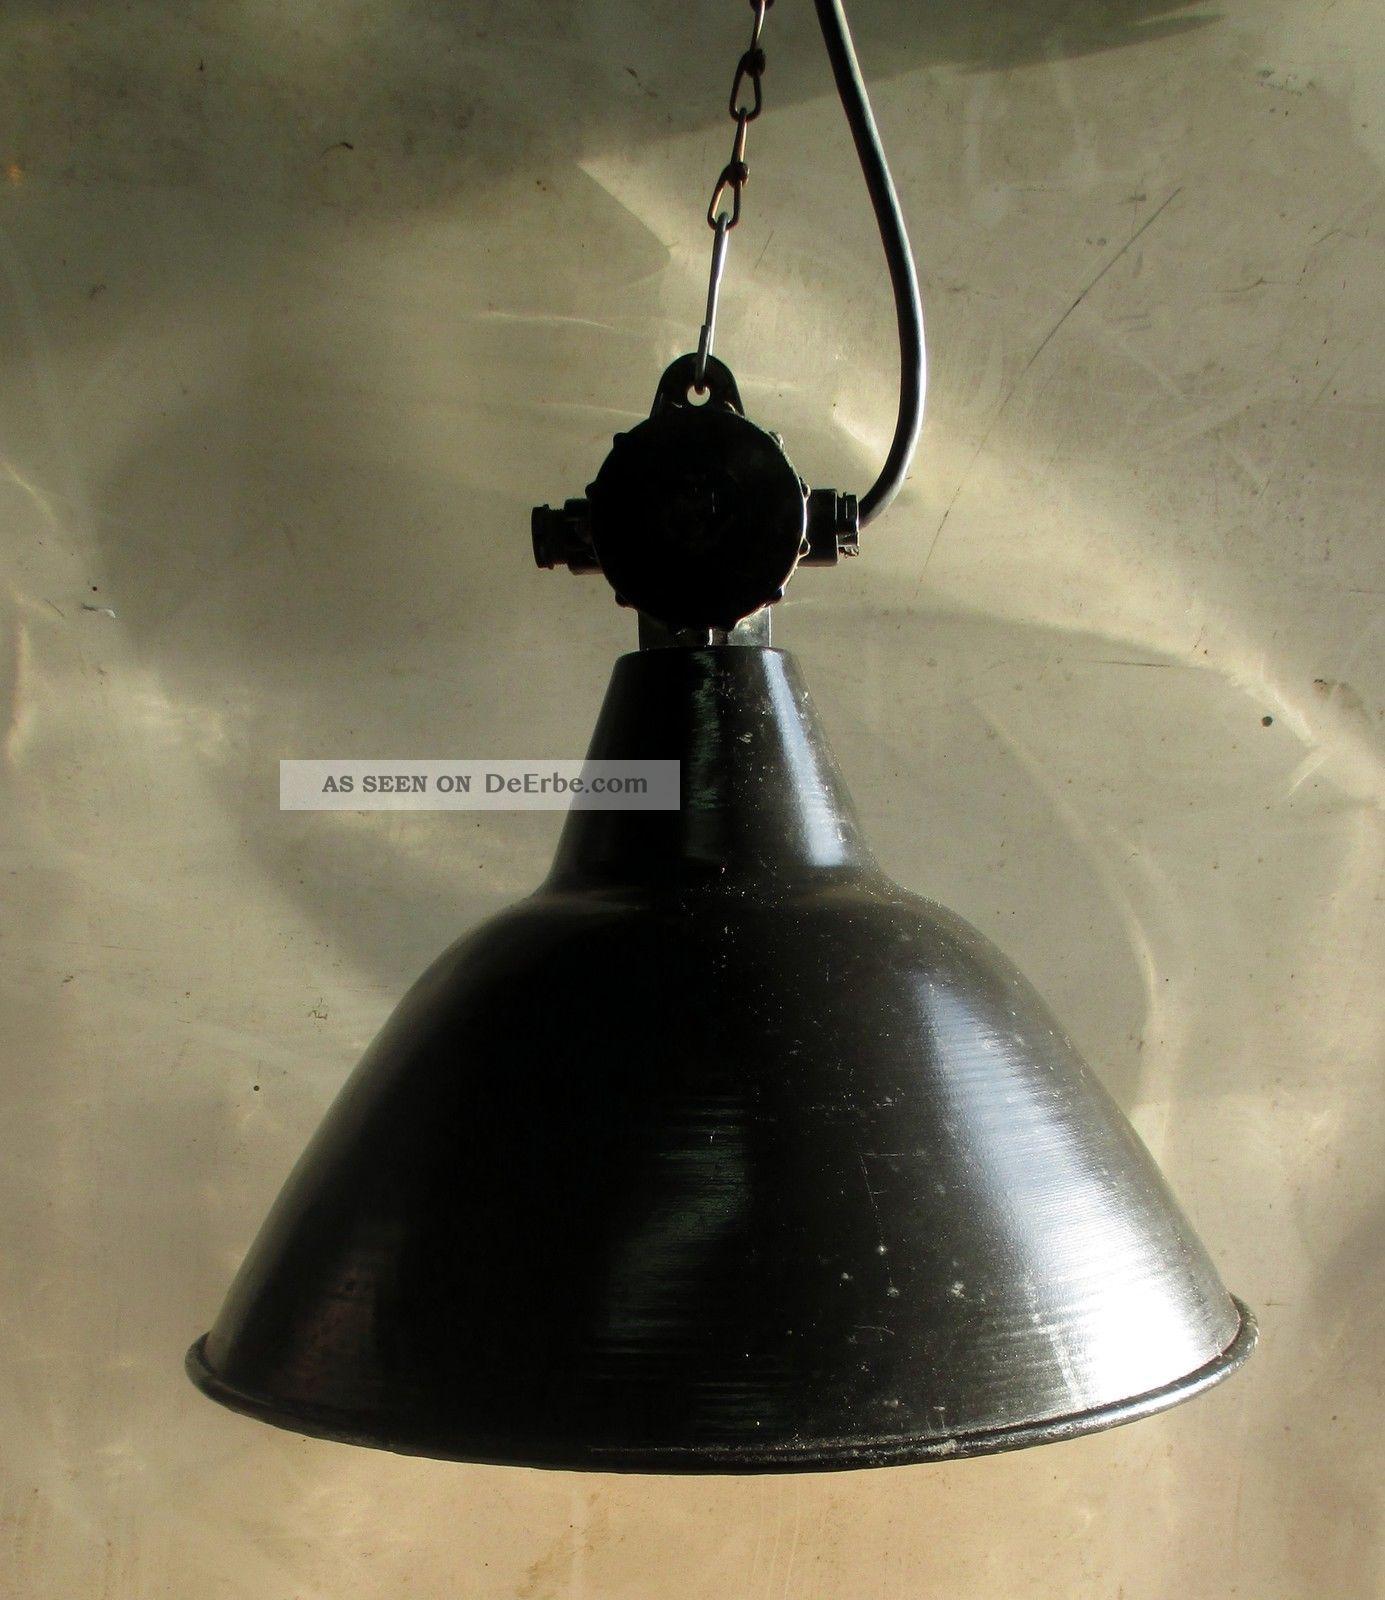 alte fabrik lampe emaile 43cm e27 industrie lampe. Black Bedroom Furniture Sets. Home Design Ideas